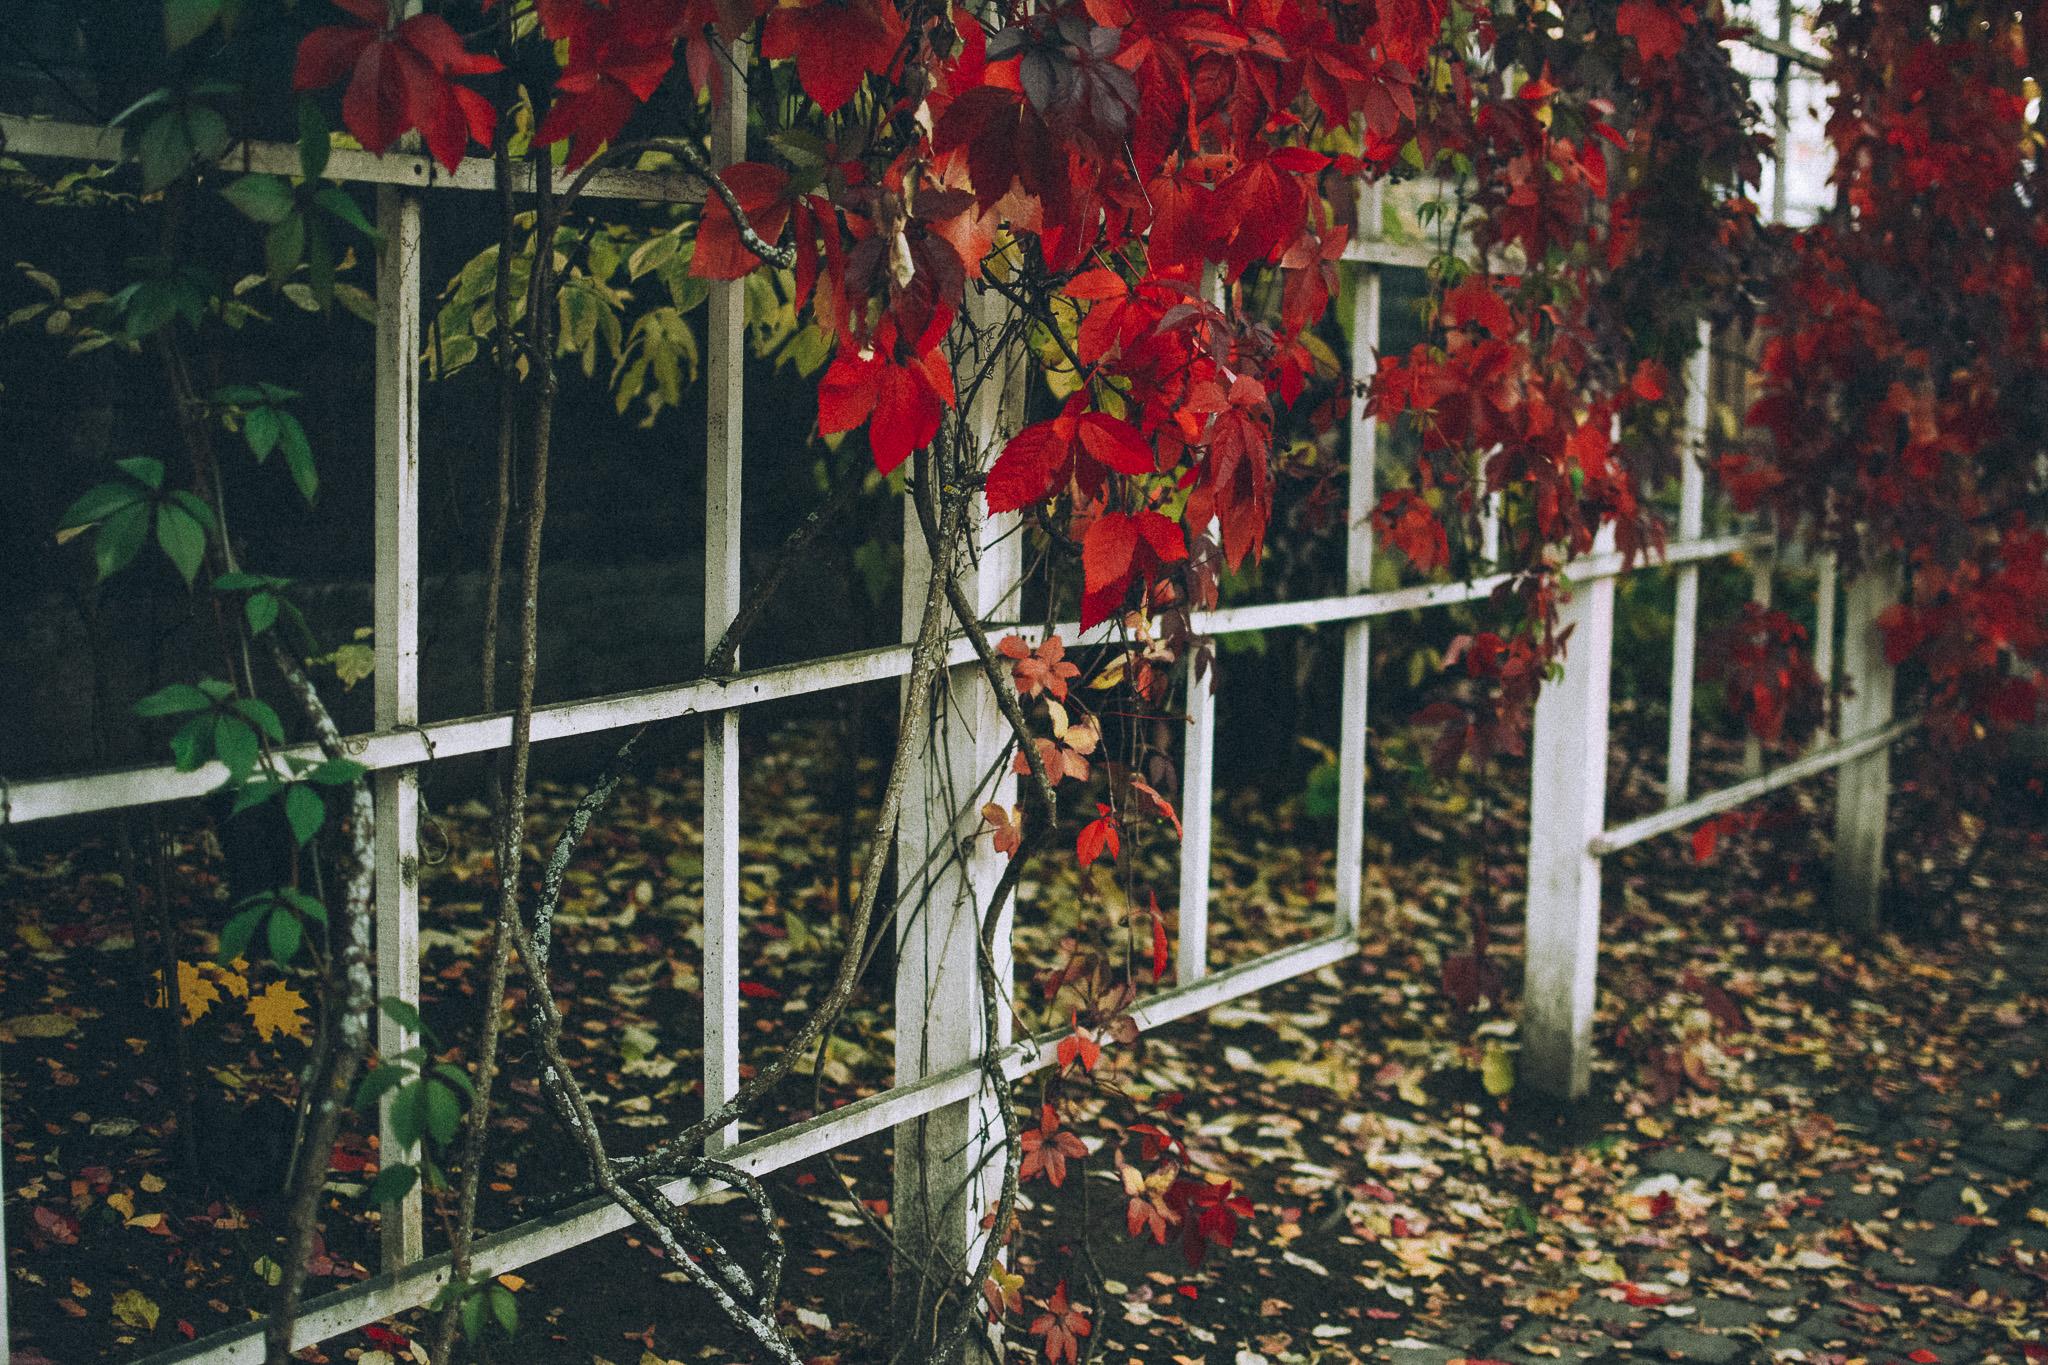 10-02-Spielplatz-fall-14_LR edited_FB.jpg